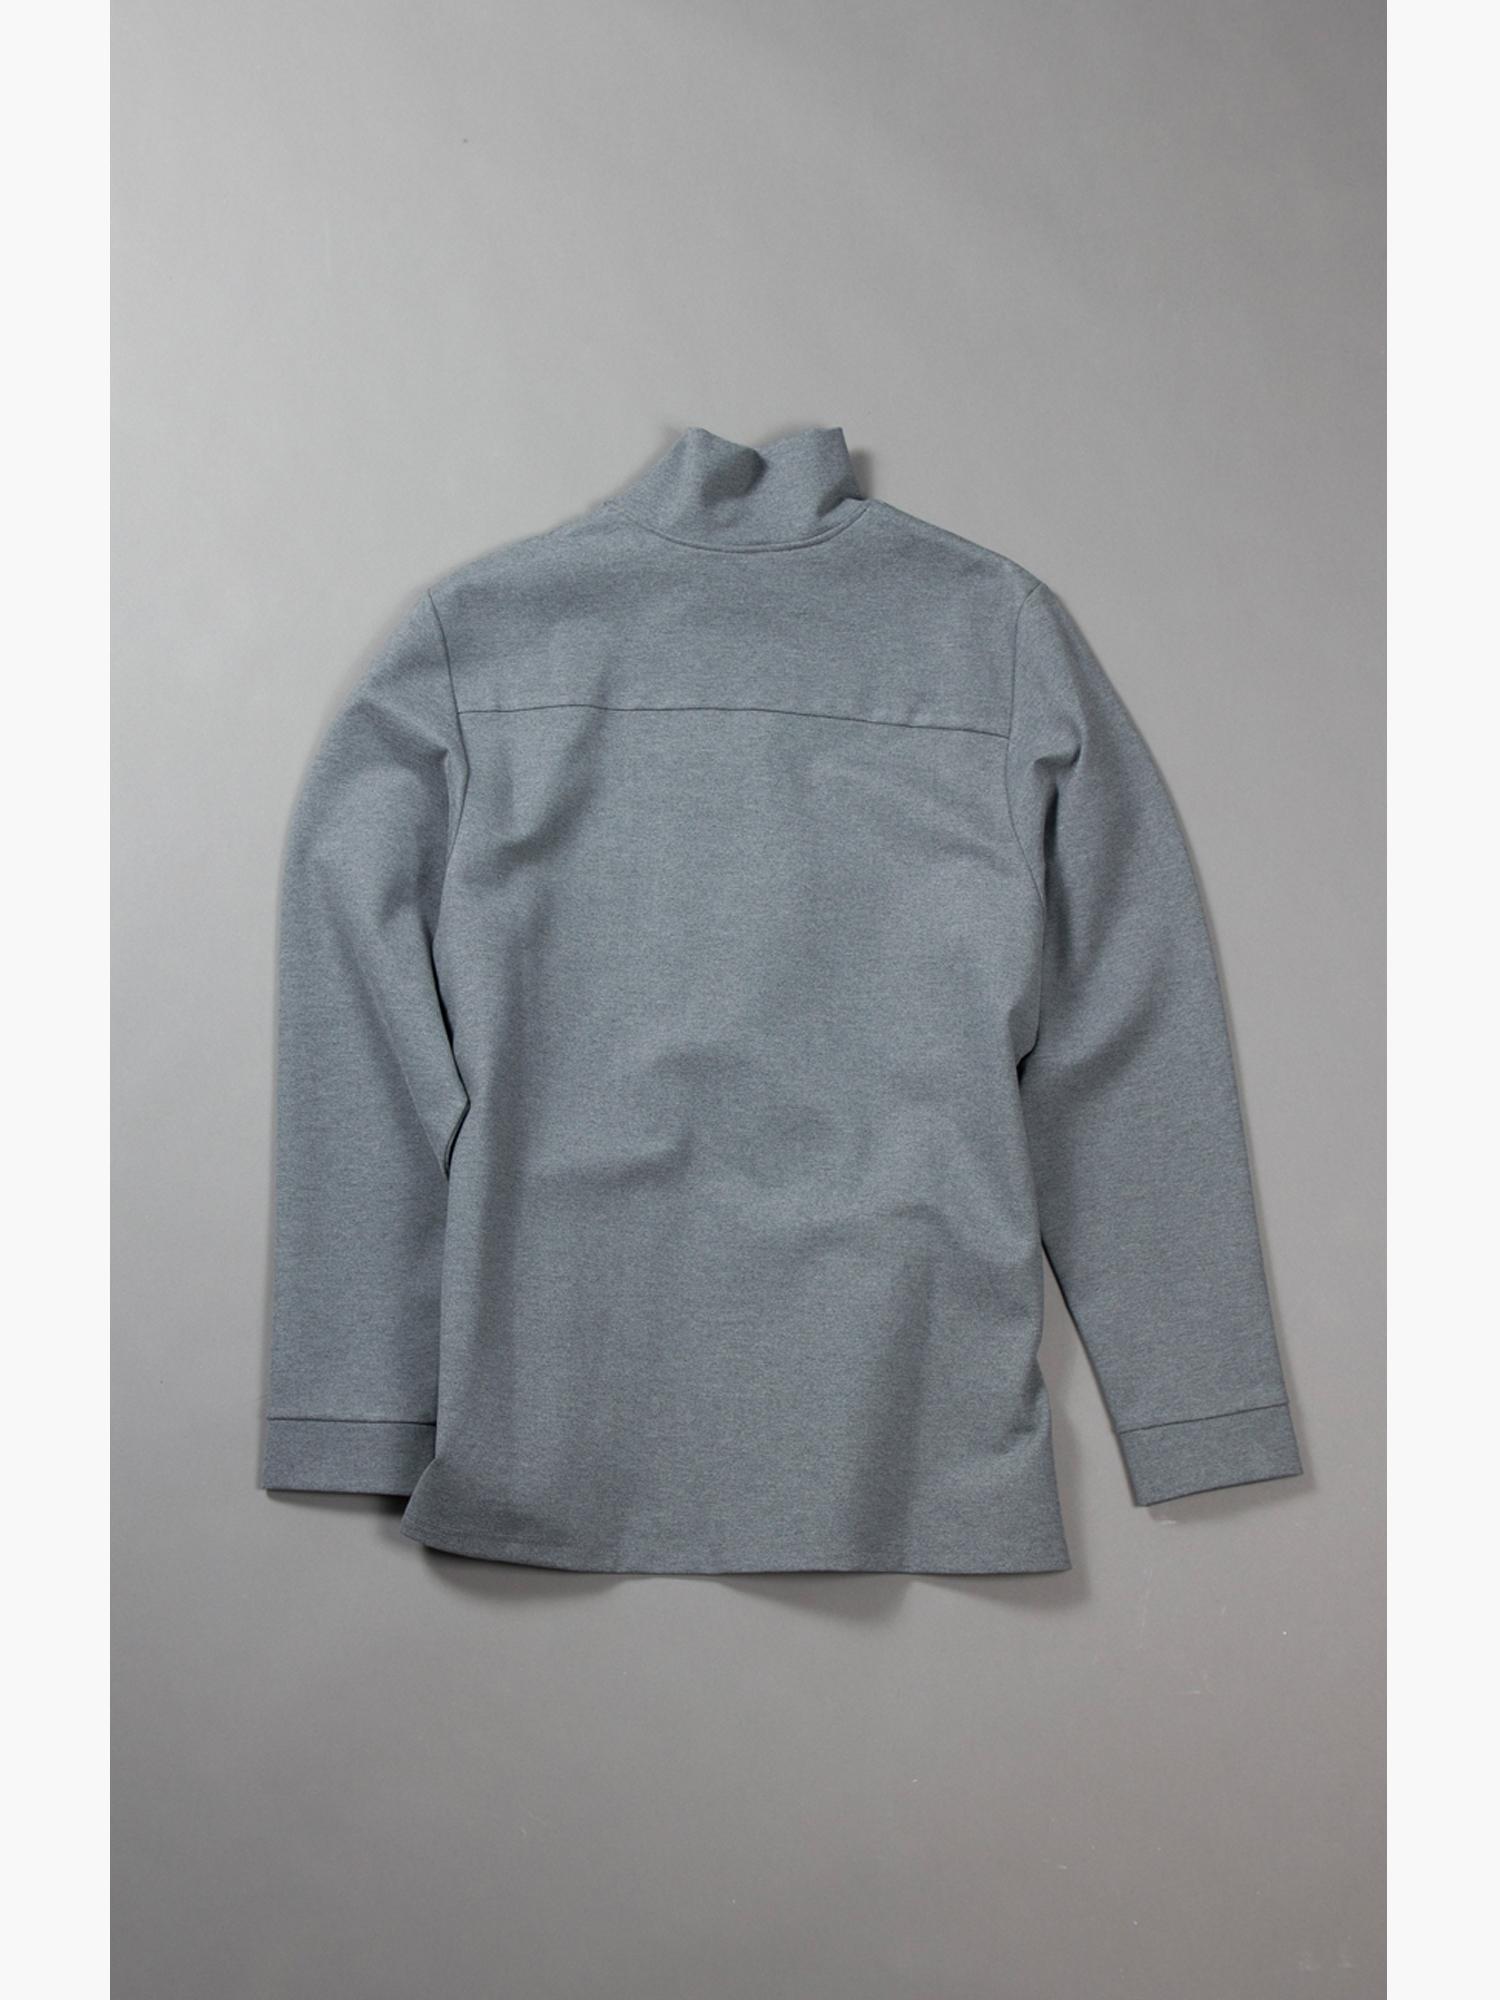 ATHRTY_havilah_sweater_grey_b